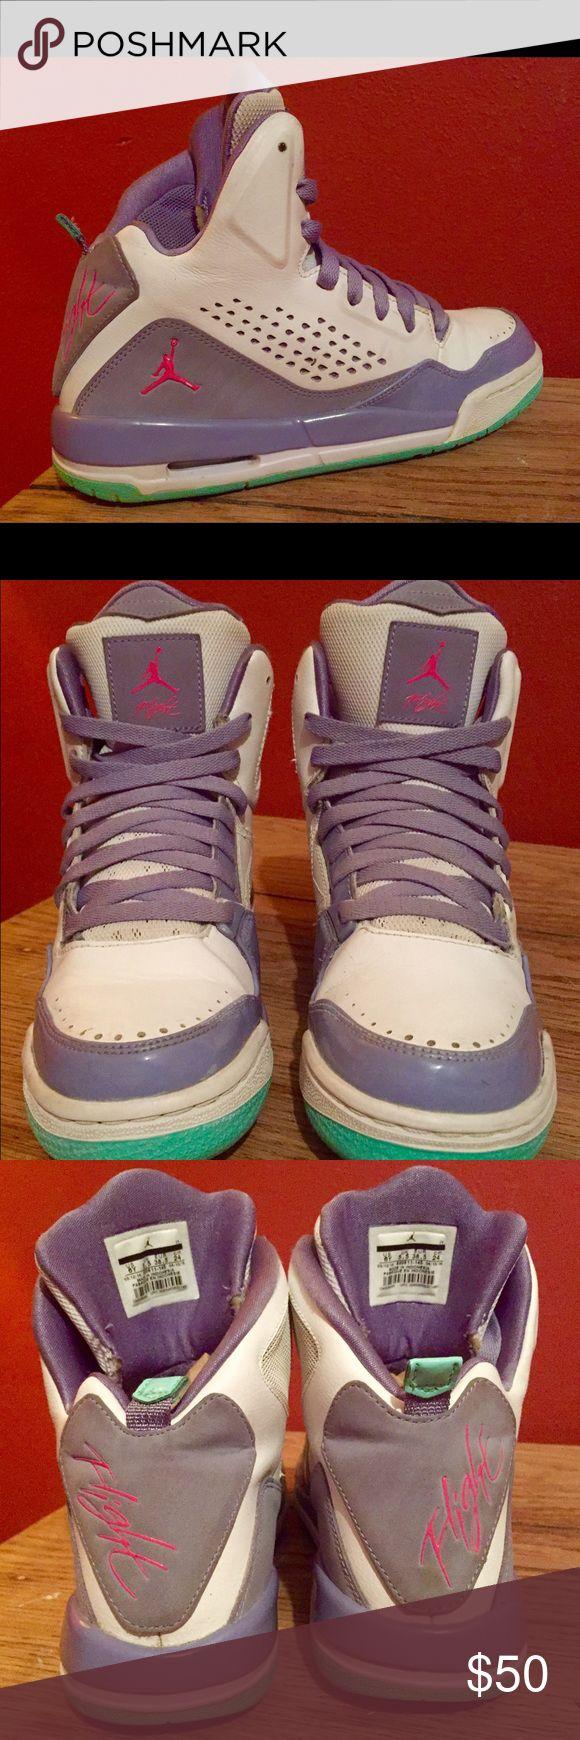 Air Jordan Flight Shoes - Size 6Y Air Jordan Flight Shoes - Size 6Y - Purple, gray, hot pink, light teal - see pictures! Super cute & great condition ♥️ Air Jordan Shoes Athletic Shoes